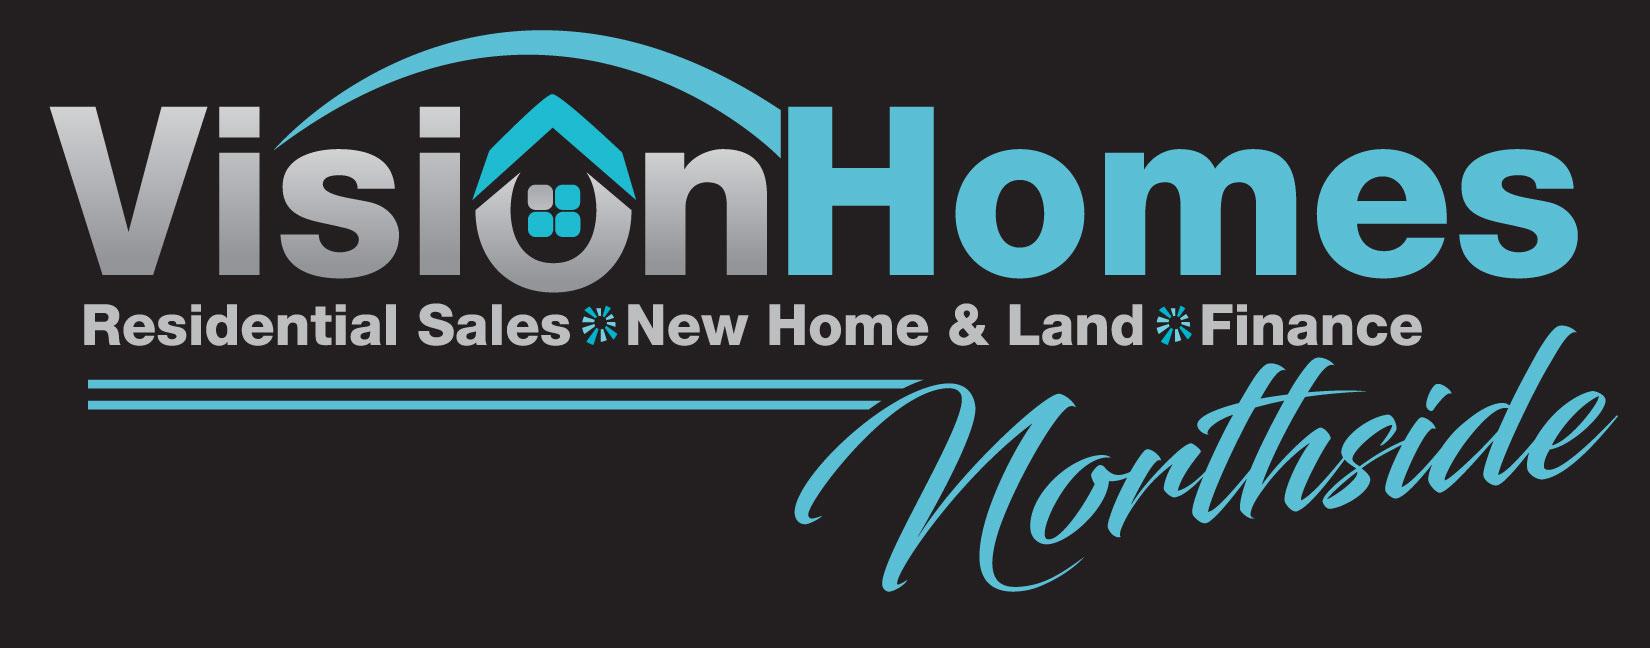 Vision Homes Northside, Nundah, 4012